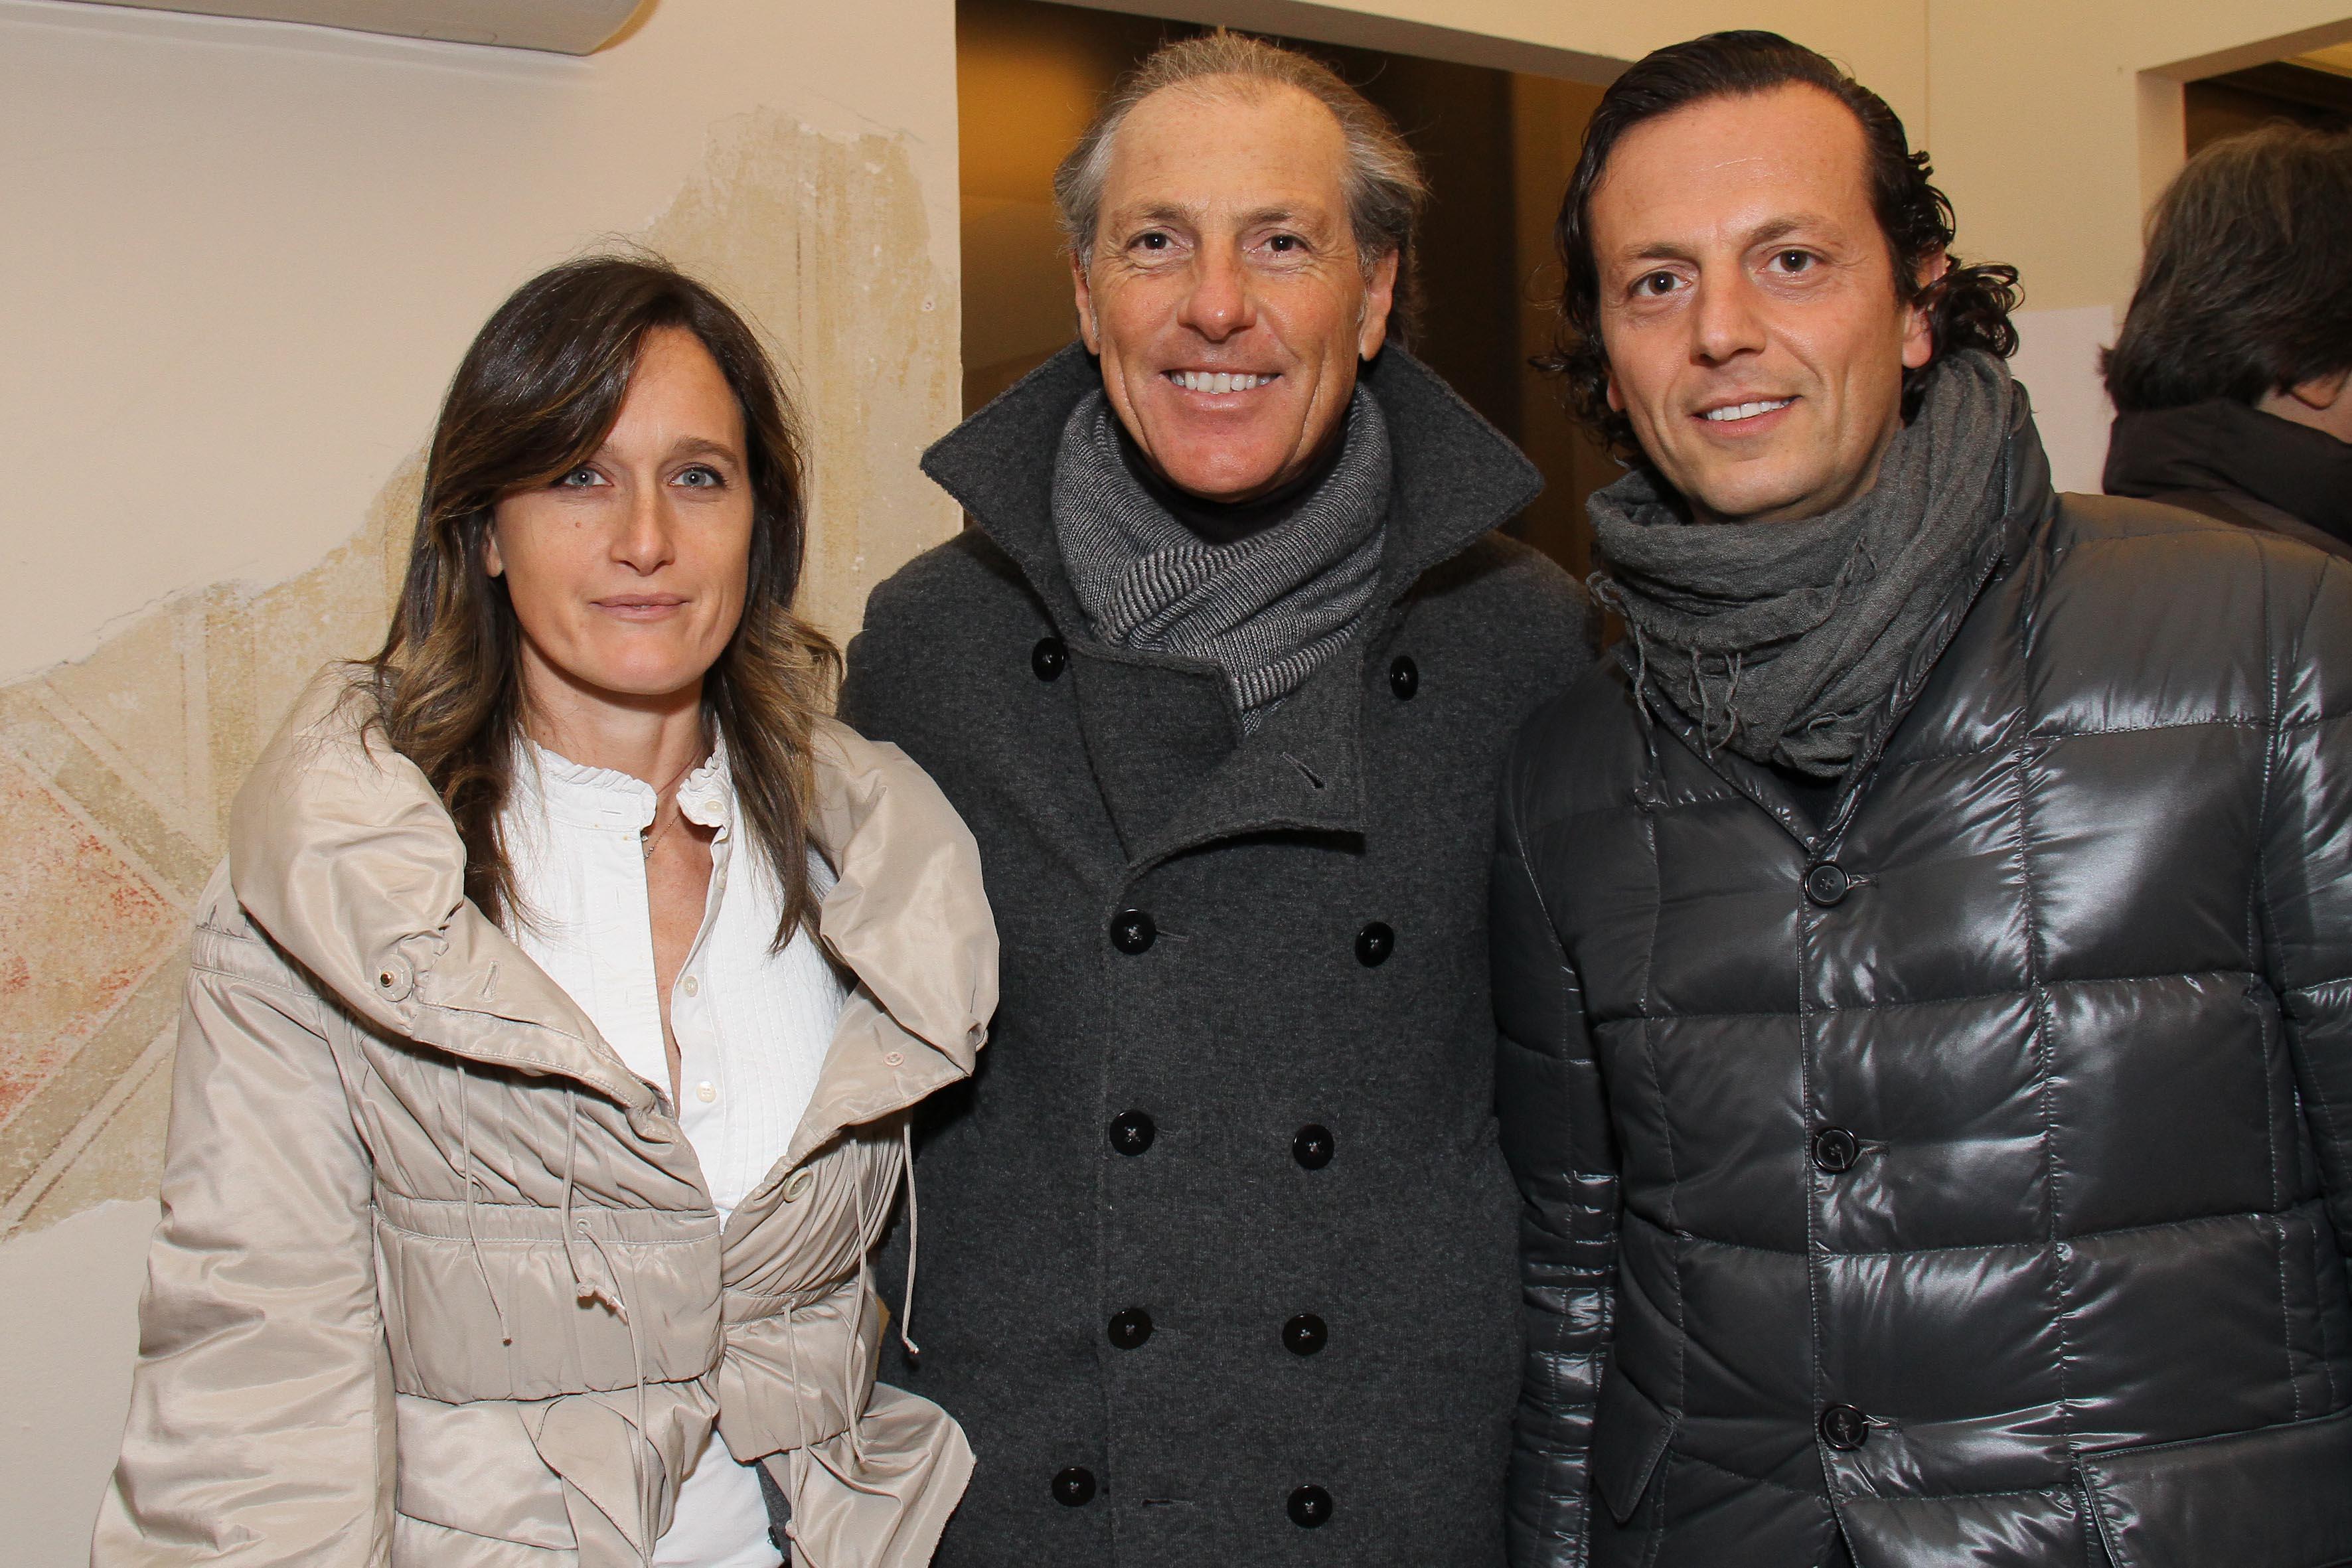 PRESSPHOTO Firenze, palestra OM. Nella foto Claudia Carmignani, Stefano Marianelli, Gabriele Onasina